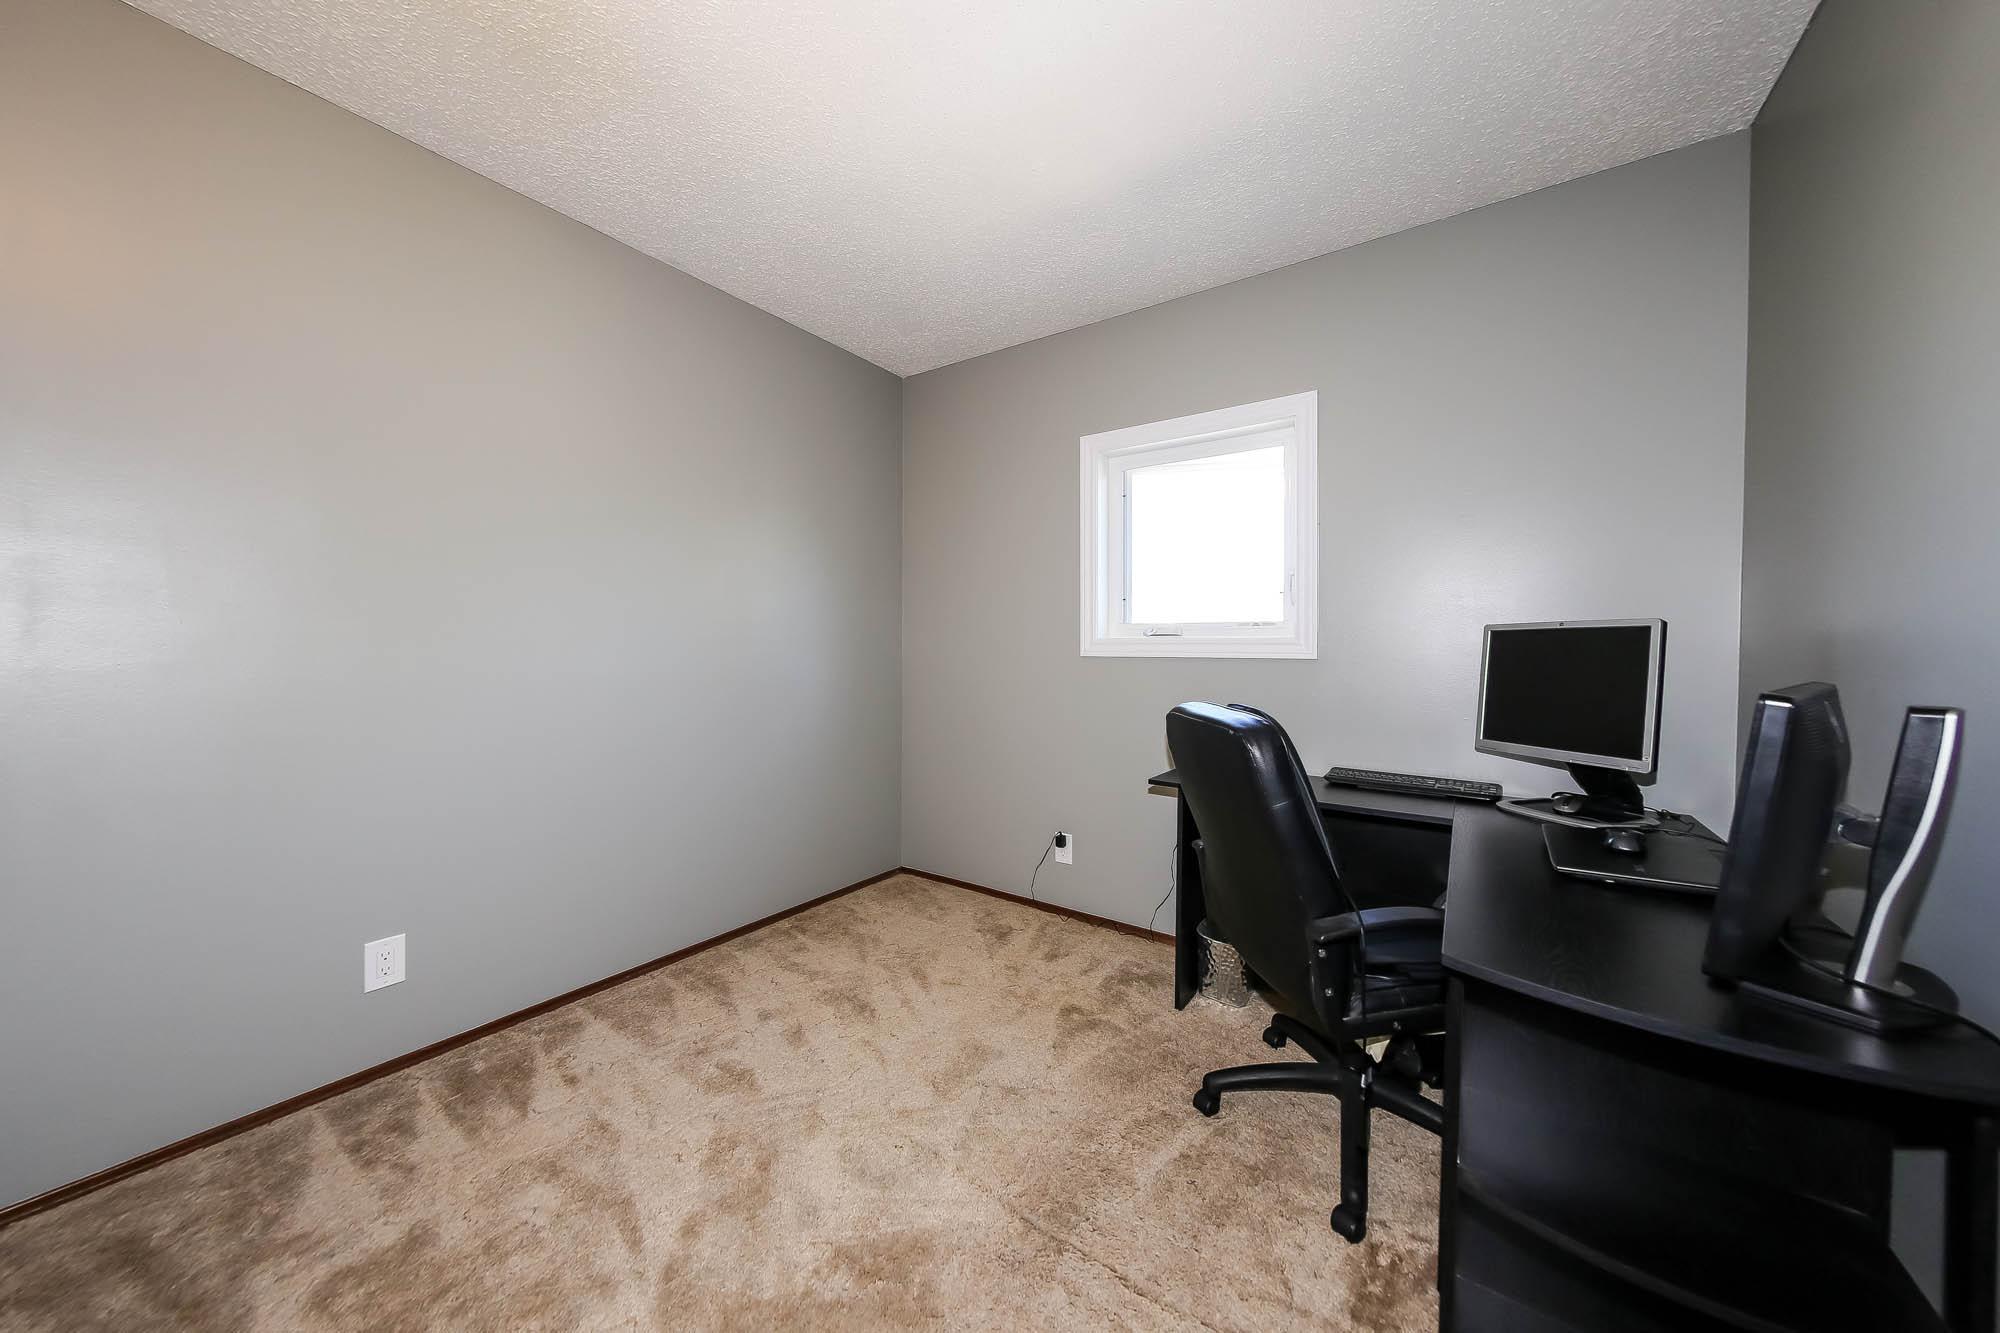 69 Carriage House Road, Winnipeg, Manitoba  R2N 2J5 - Photo 17 - 202020700